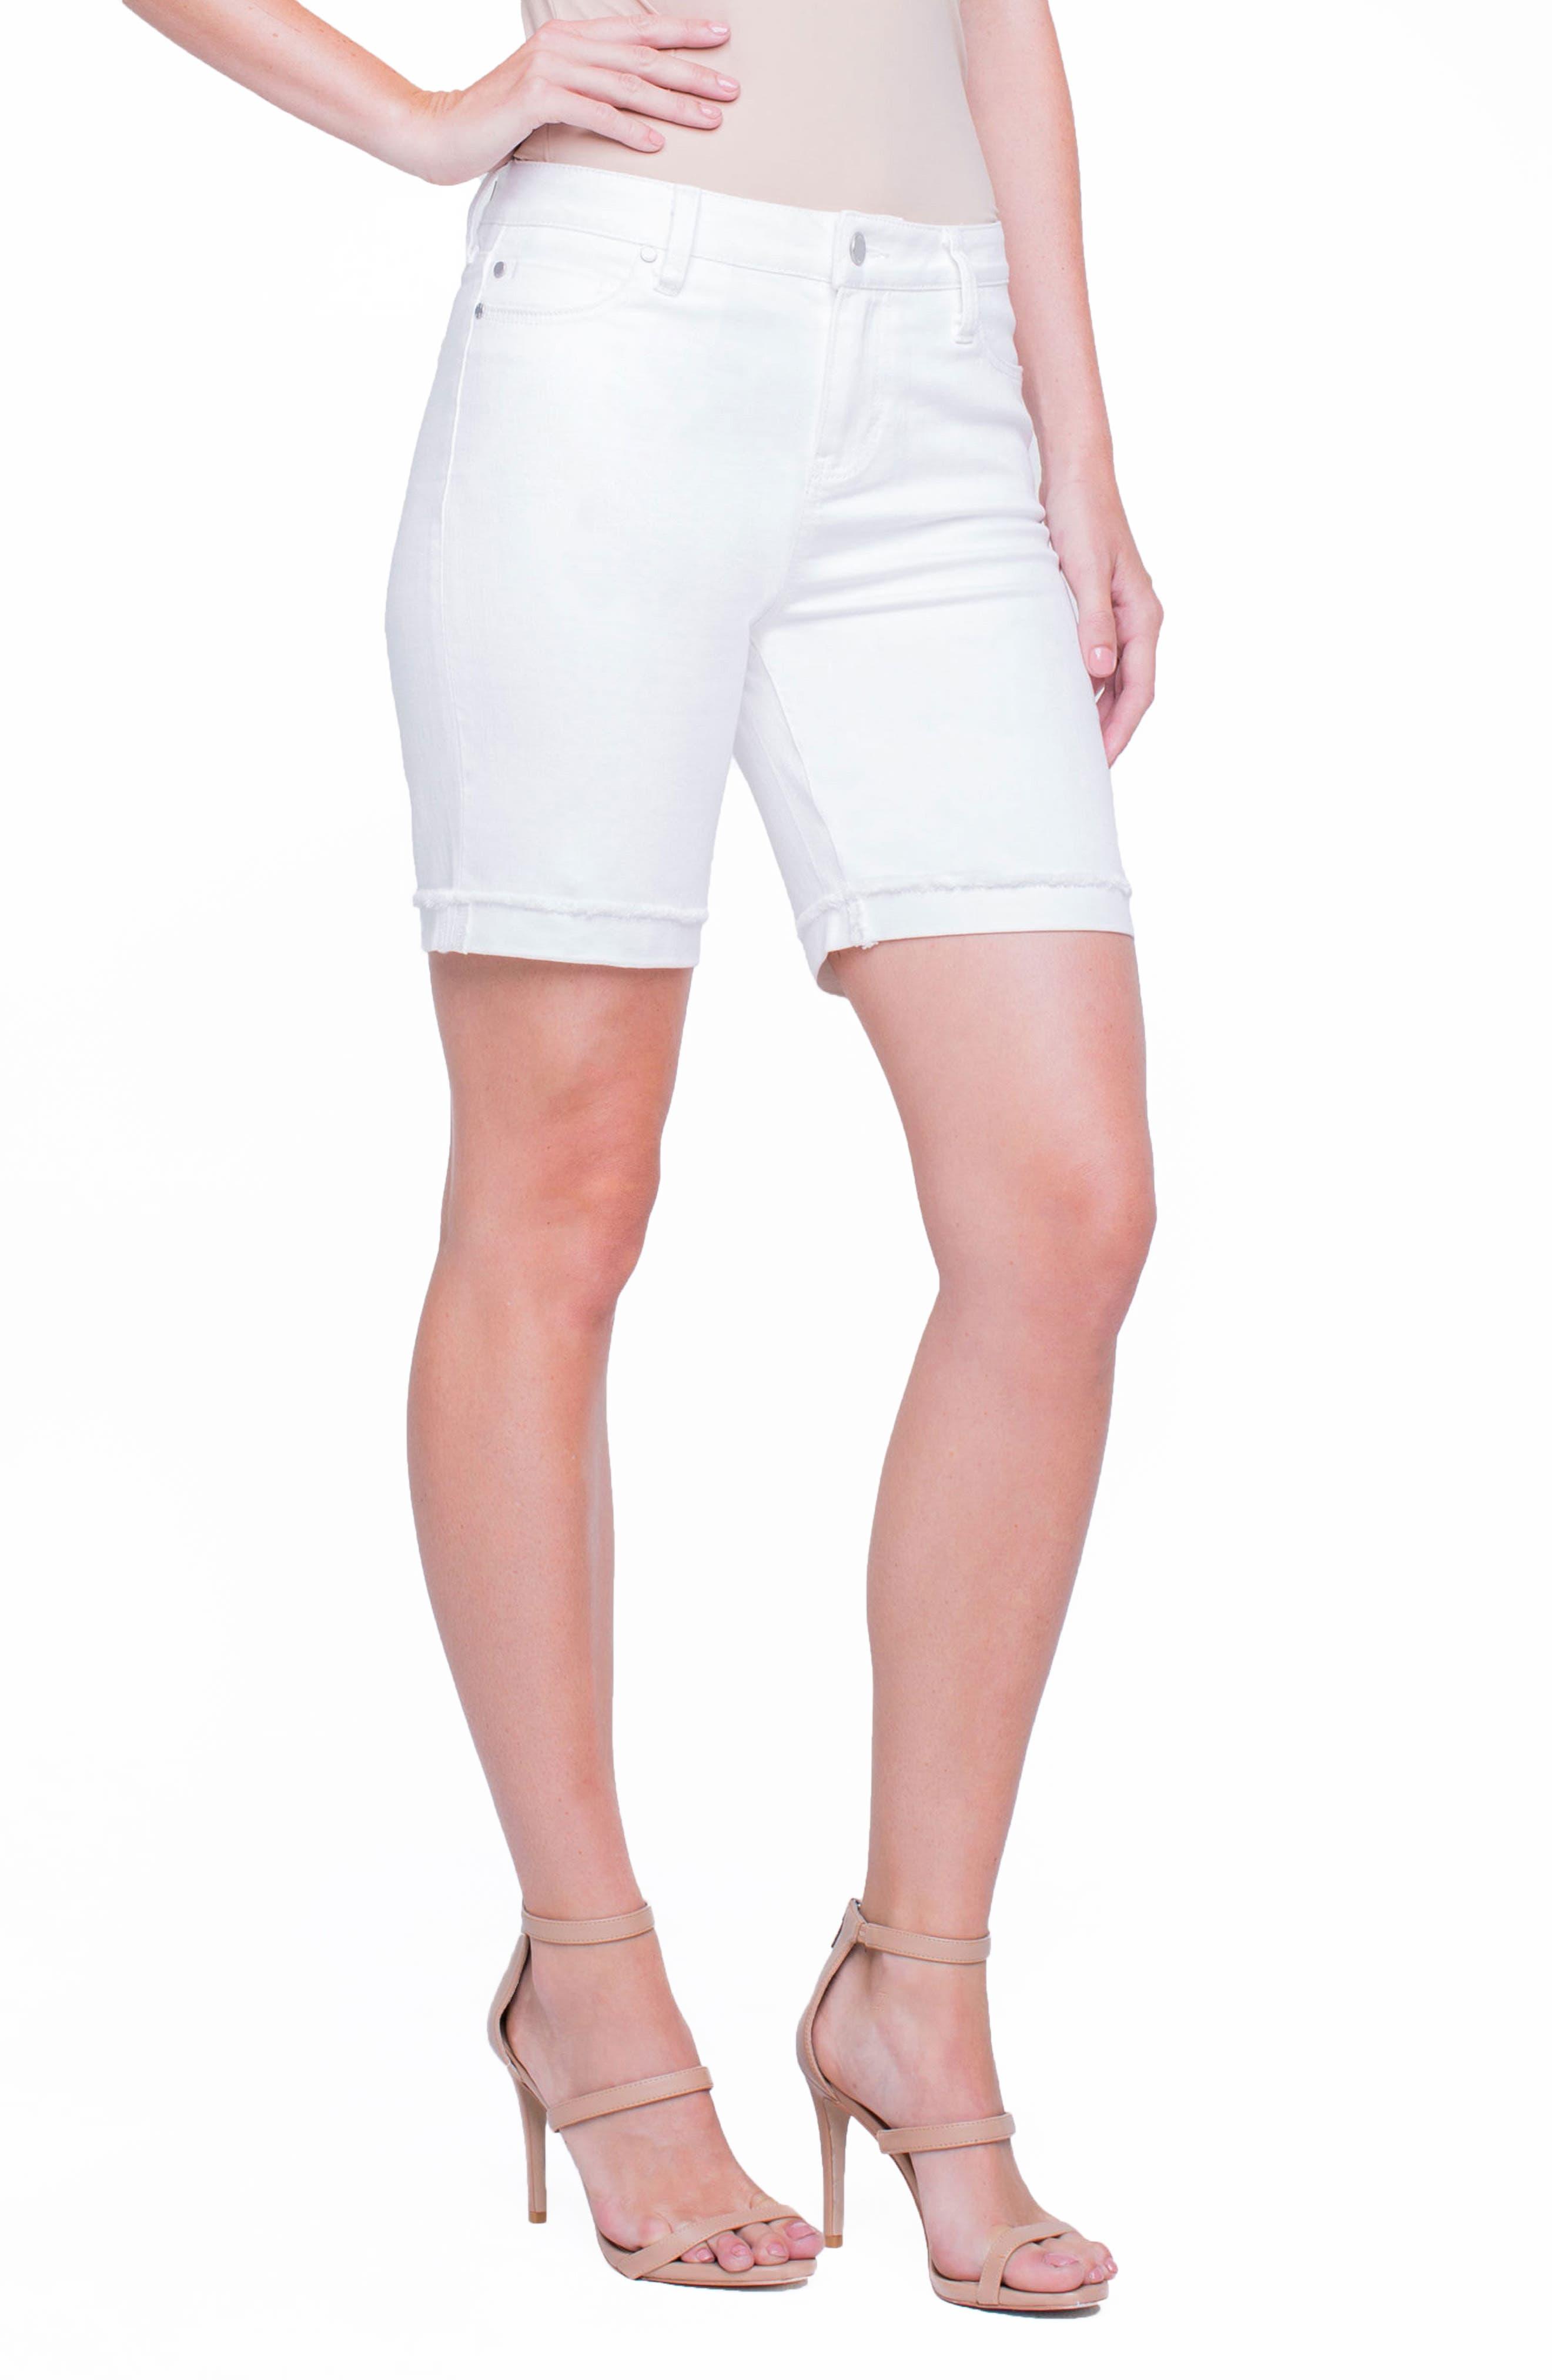 Casey White Denim Shorts,                             Alternate thumbnail 4, color,                             Bright White